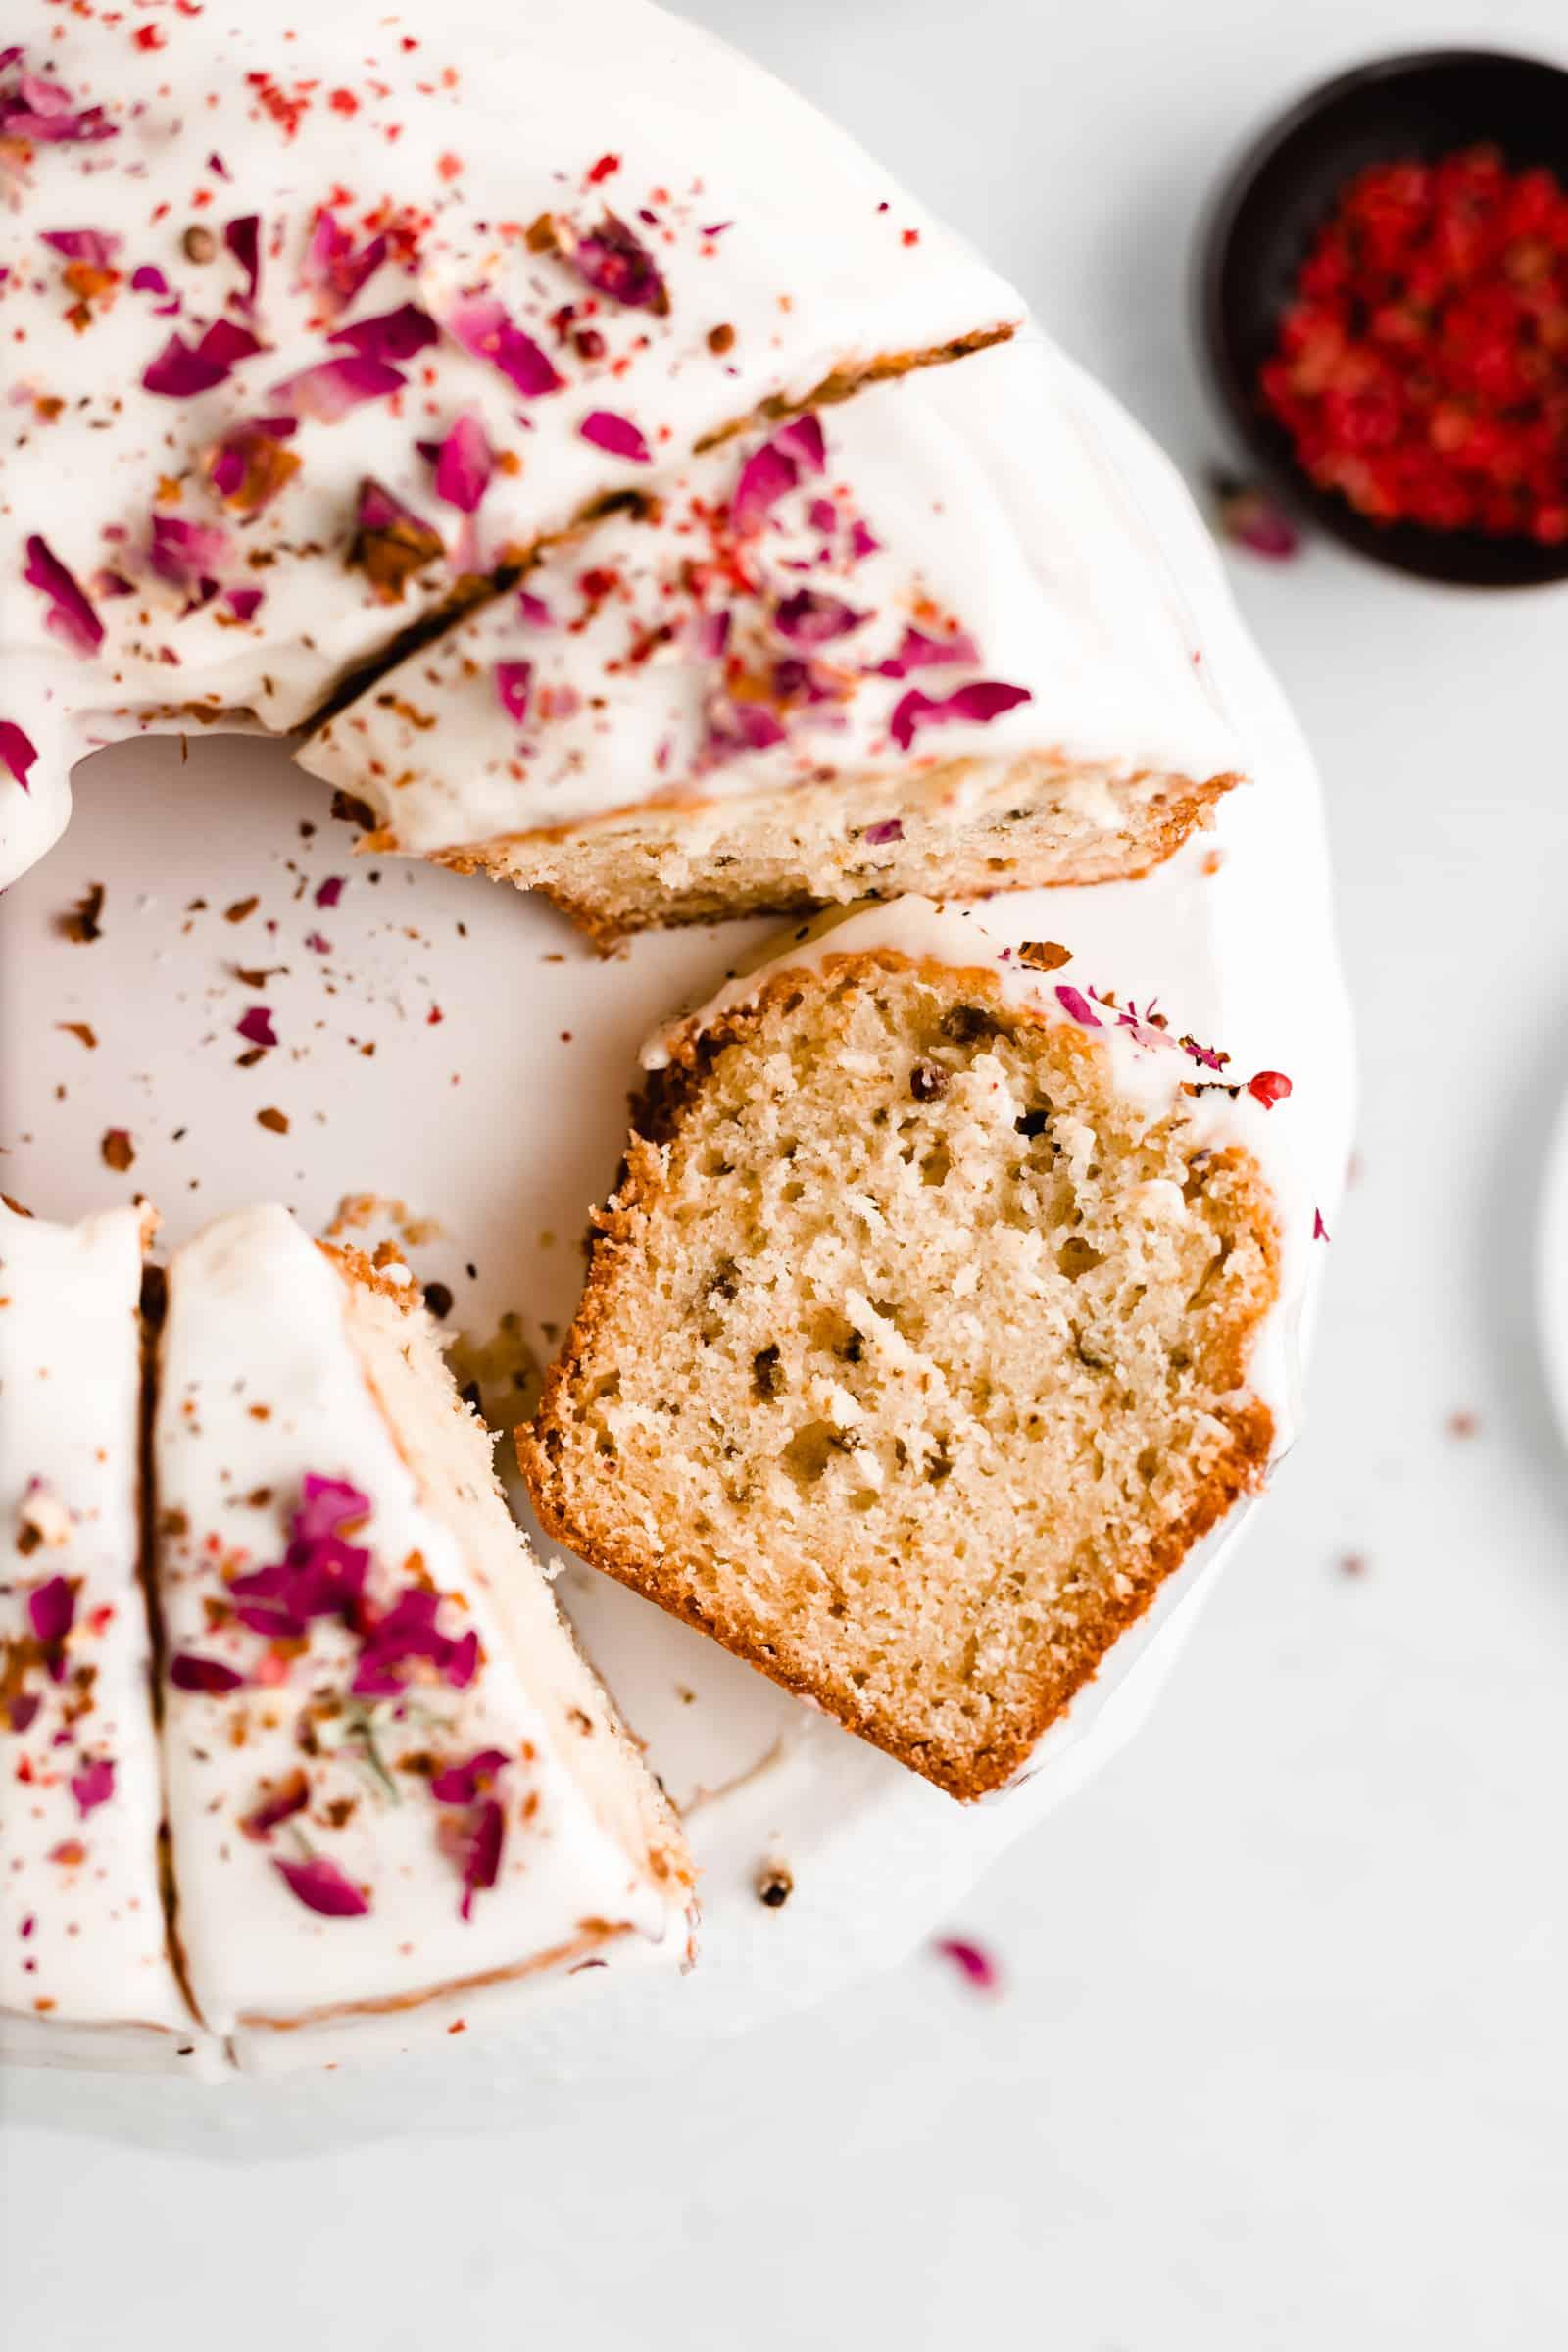 Romantic Valentine's Day Cake Recipe